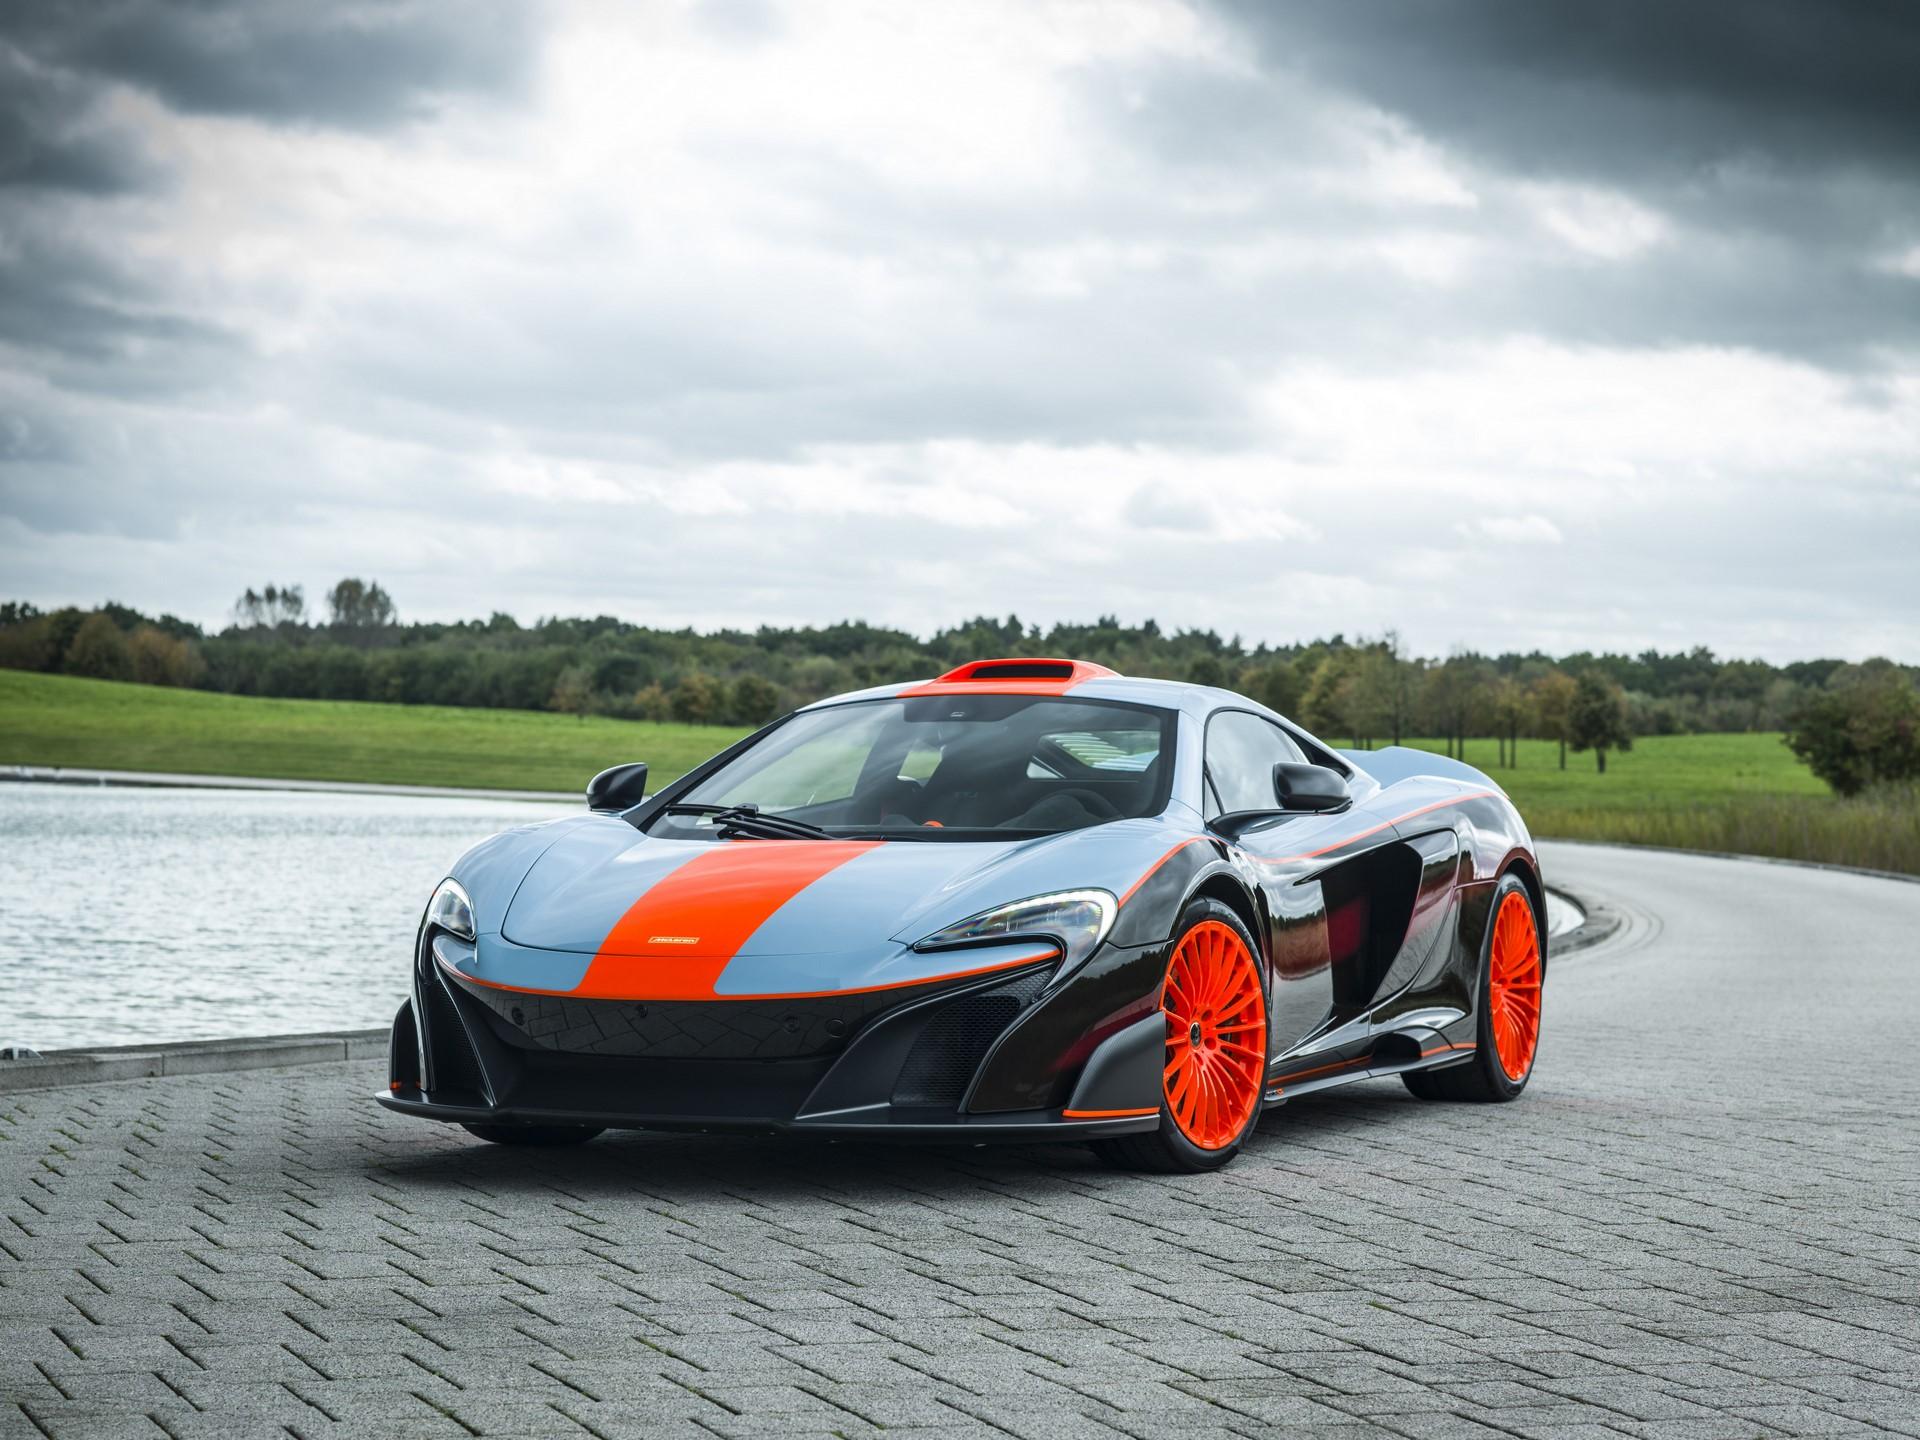 MSO Gulf Racing theme McLaren 675LT_01_exterior resized_GF Williams